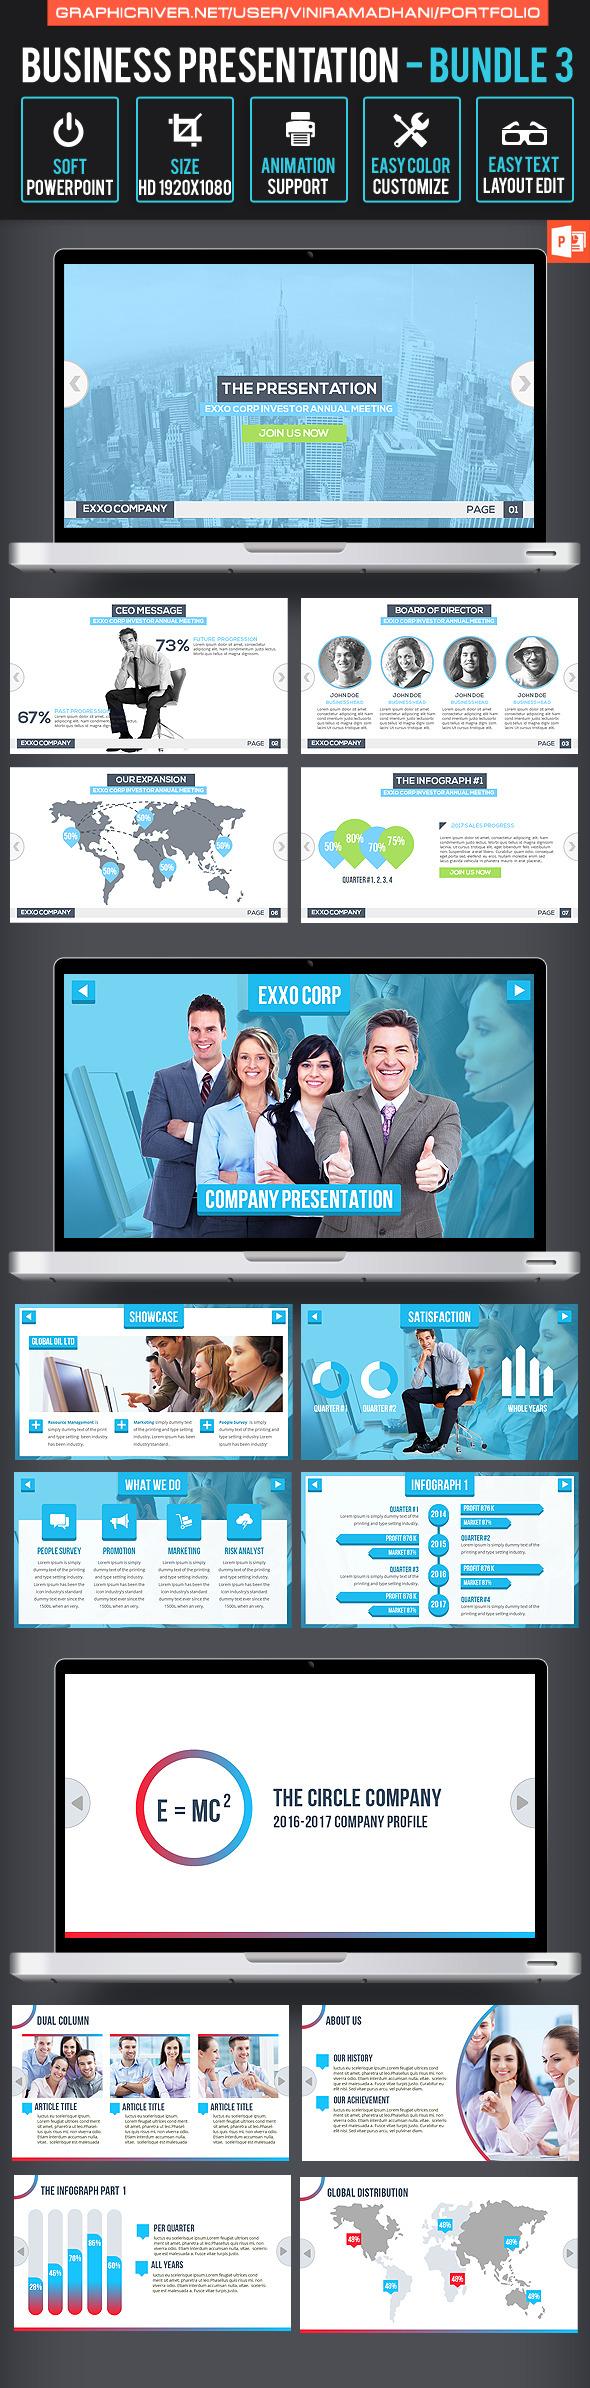 Business Presentation Bundle 3 - Business PowerPoint Templates